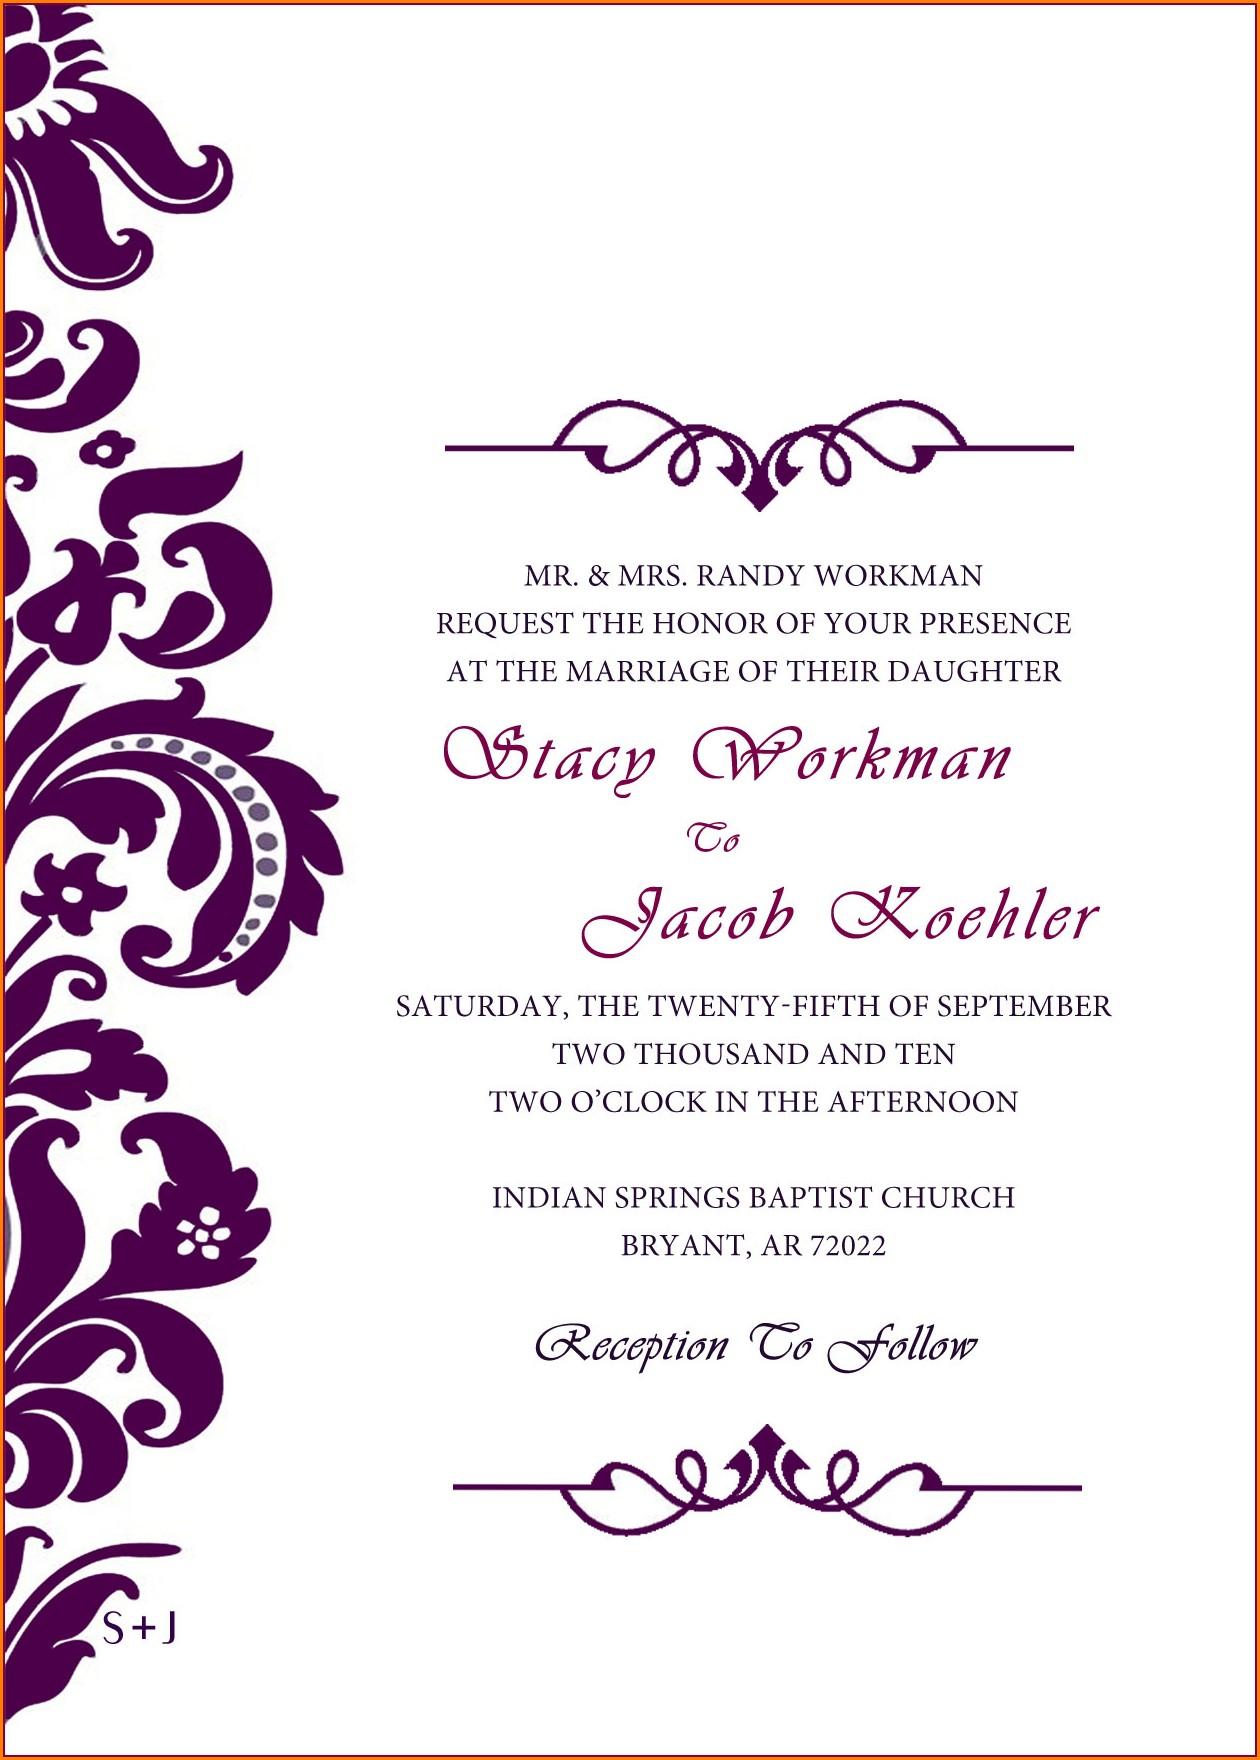 Blank Navy Blue Wedding Invitation Templates Free